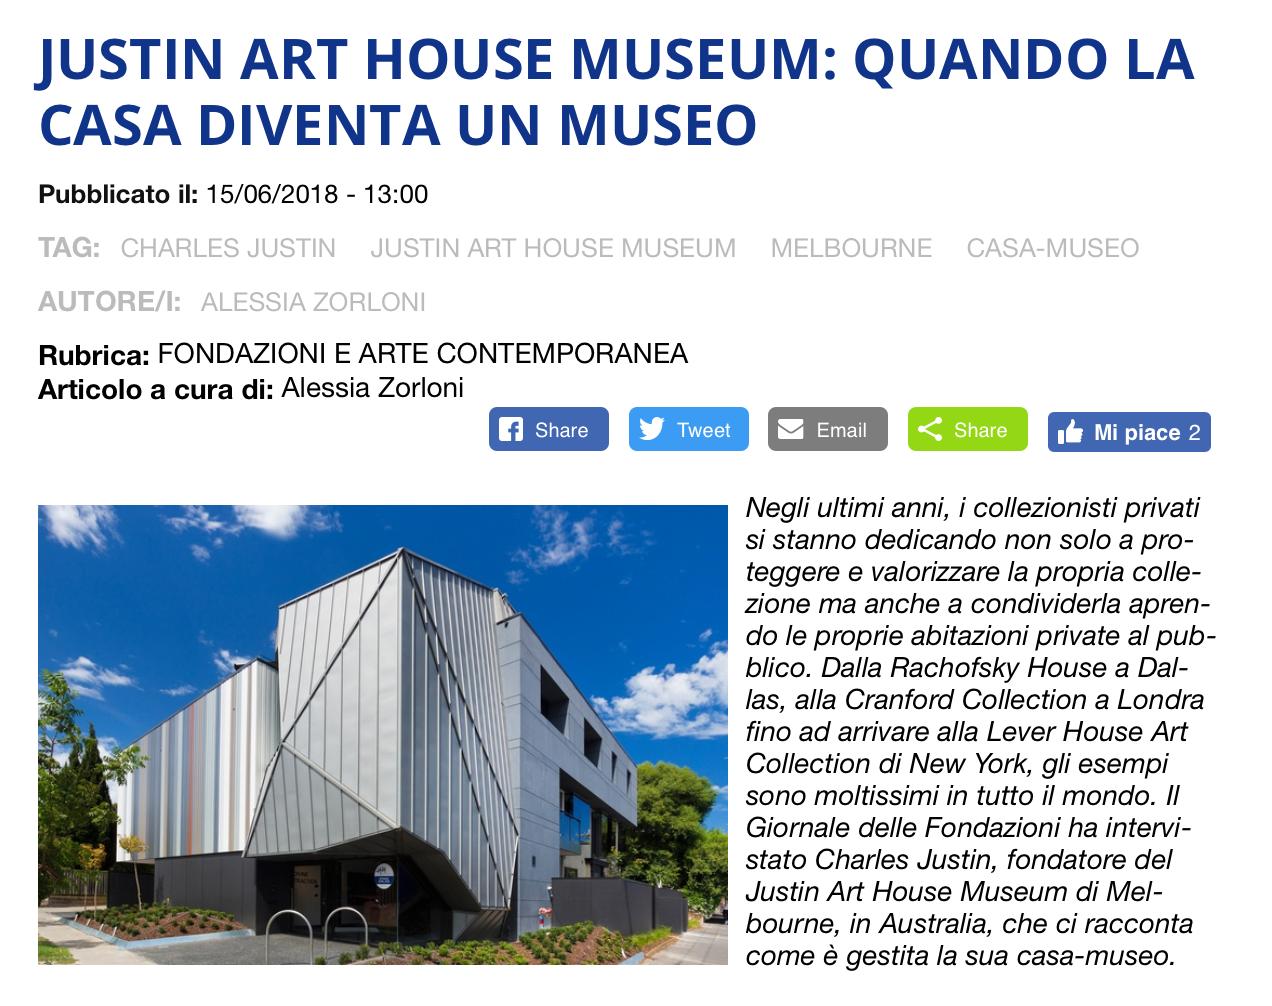 CASA-MUSEO